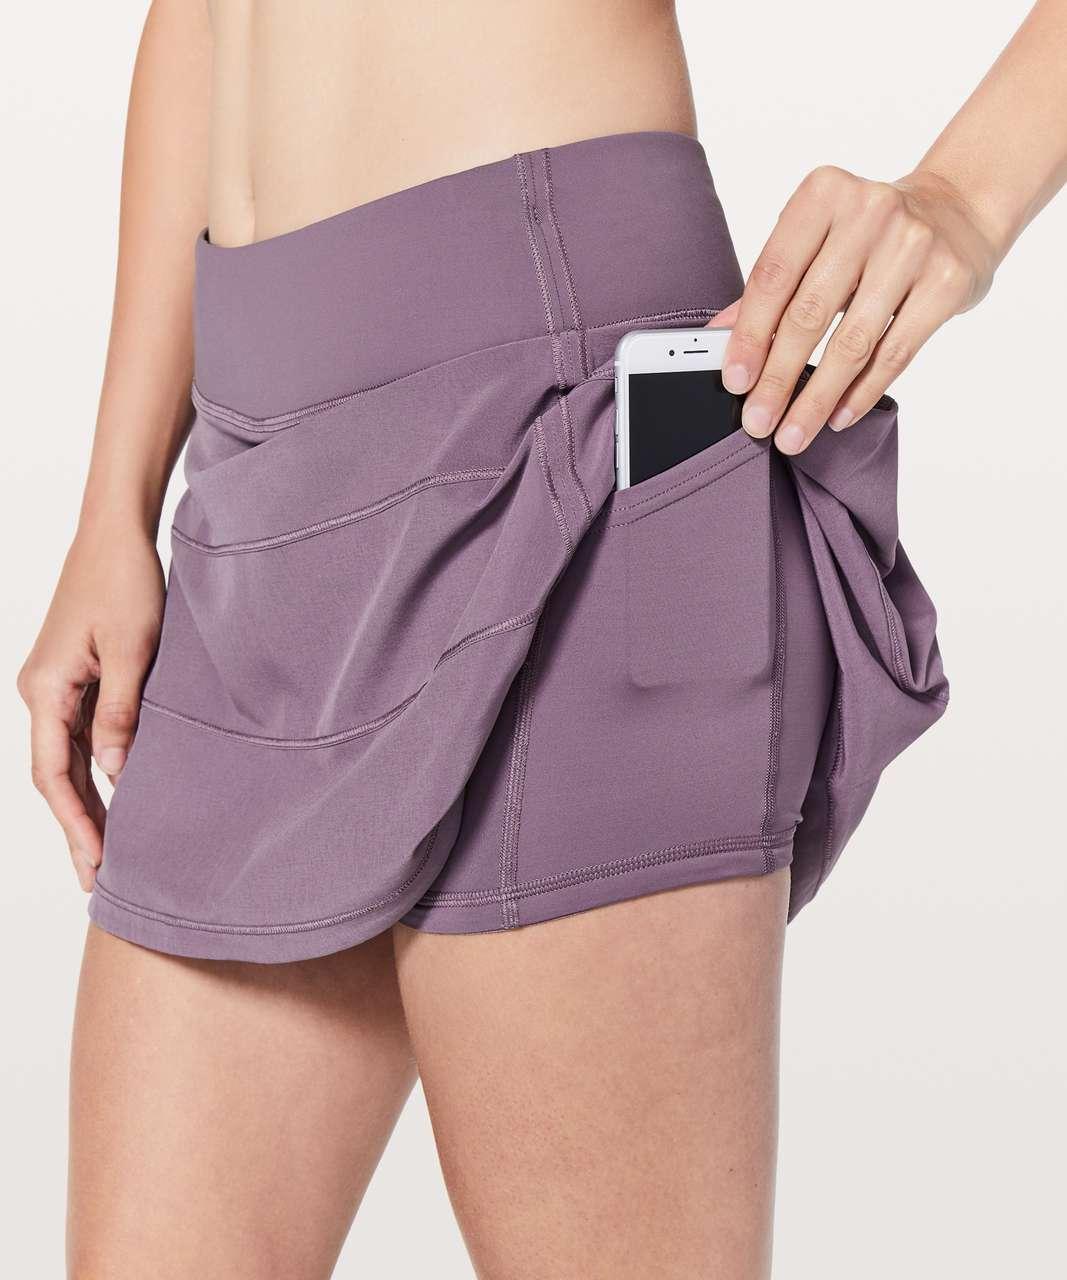 "Lululemon Pace Rival Skirt (Tall) *4-way Stretch 15"" - Smoked Mulberry"